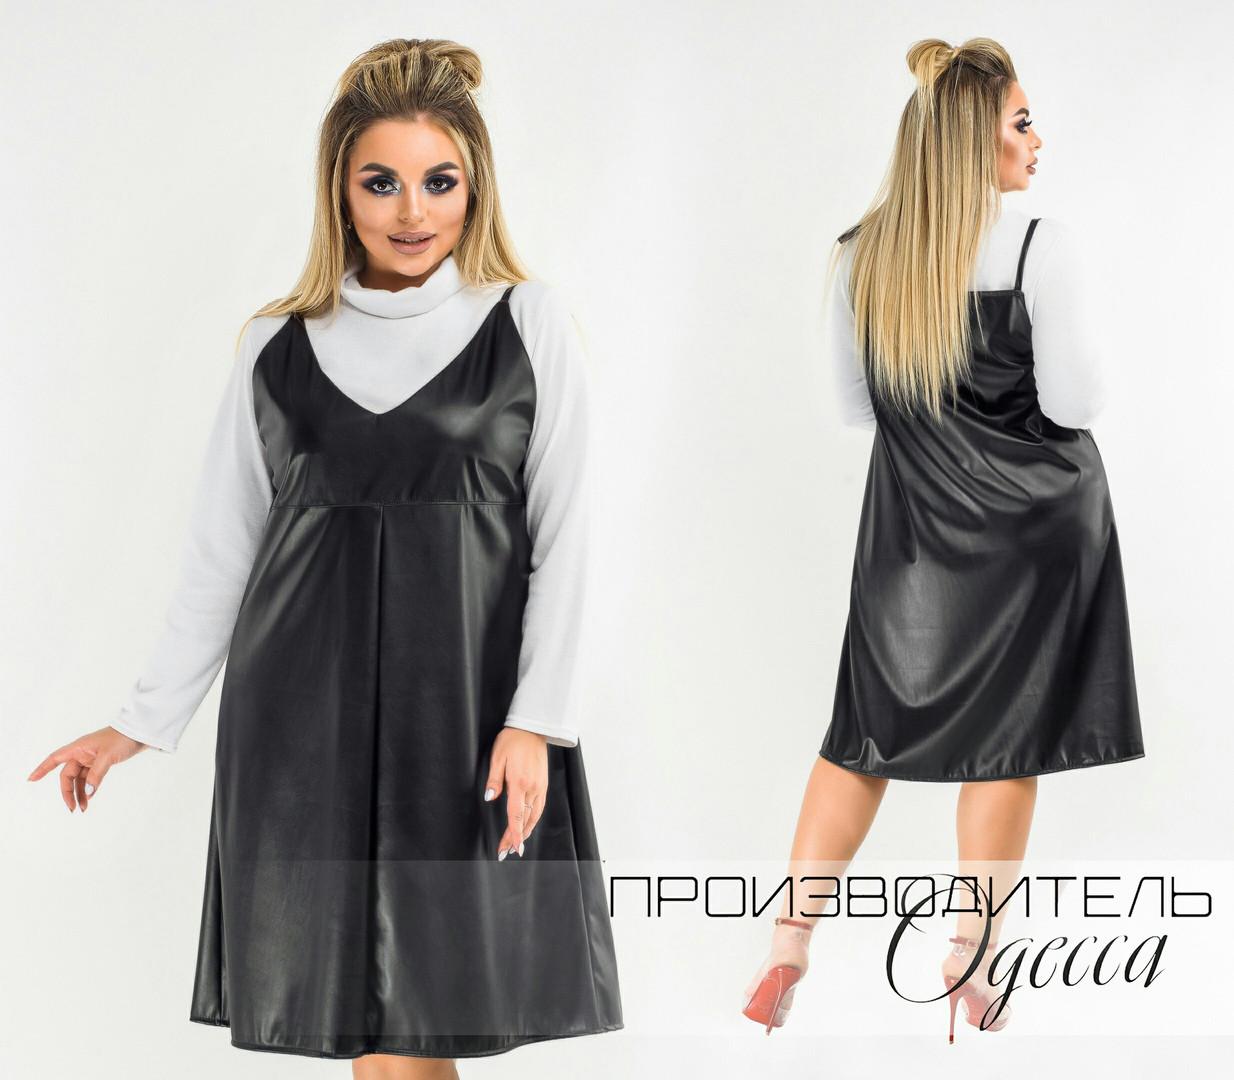 61d0531f6beaede Модный сарафан из эко-кожи батал - Интернет-магазин одежды